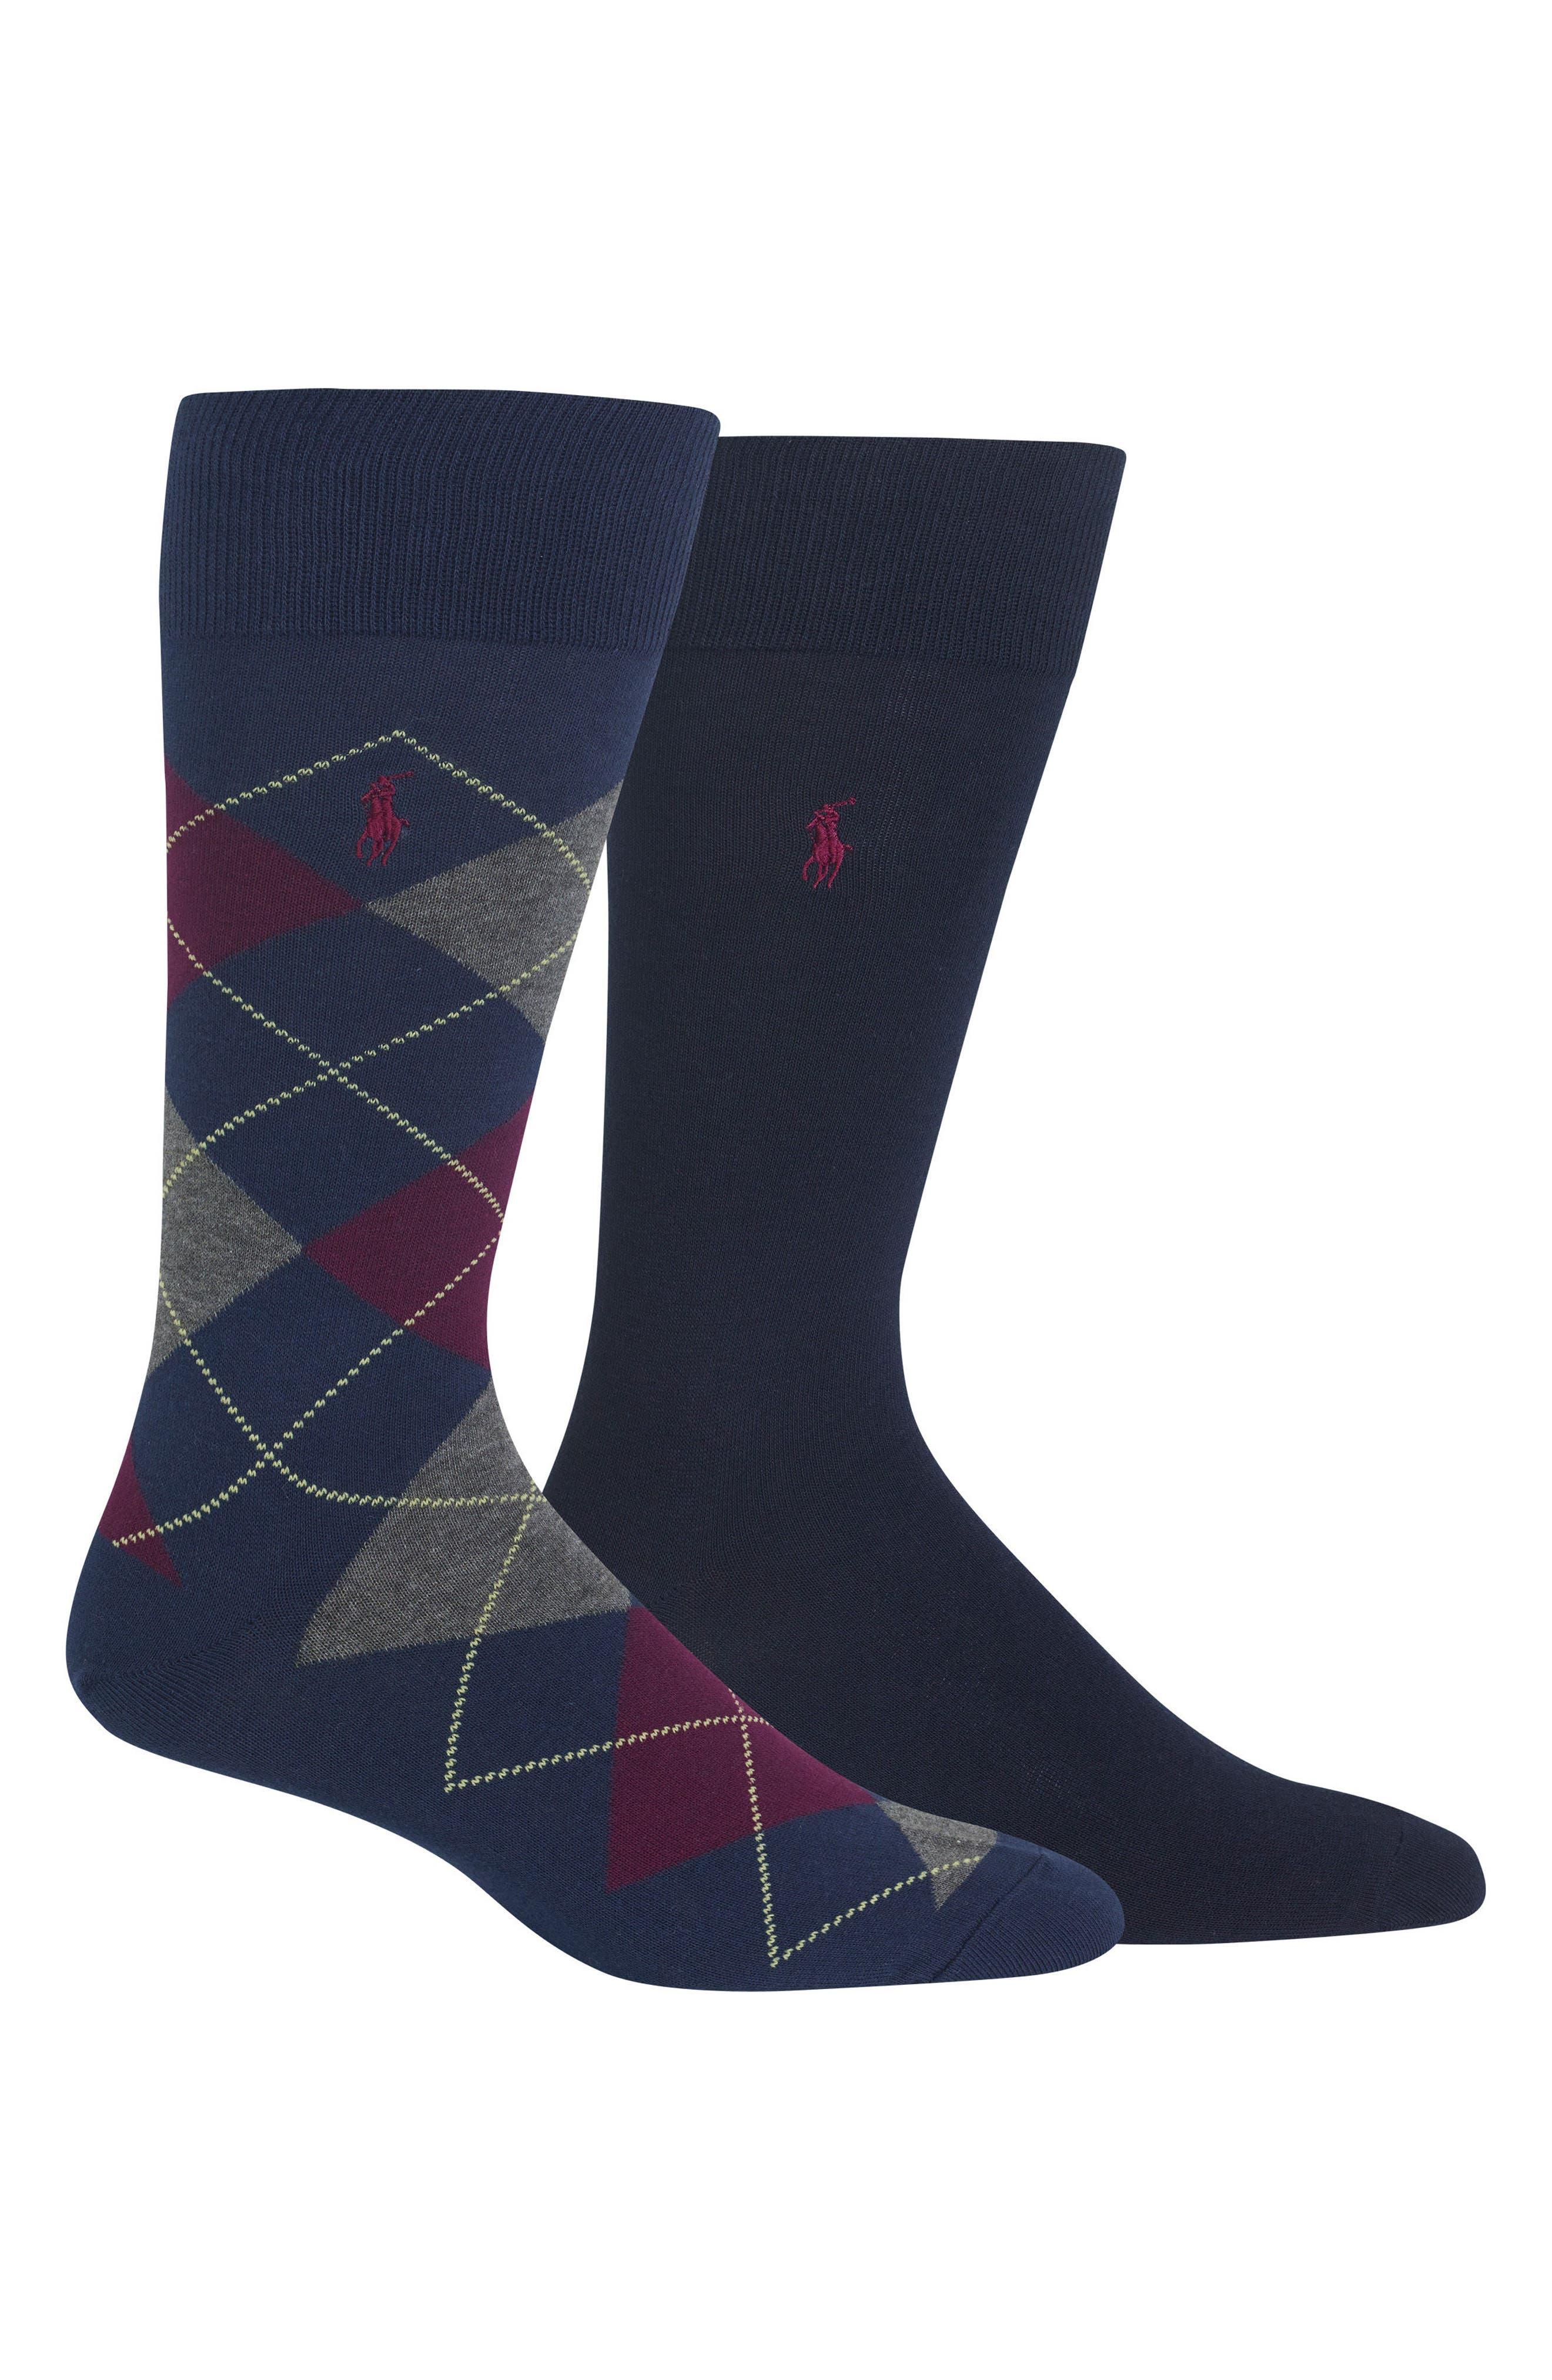 Main Image - Polo Ralph Lauren Cotton Blend Socks (2-Pack)